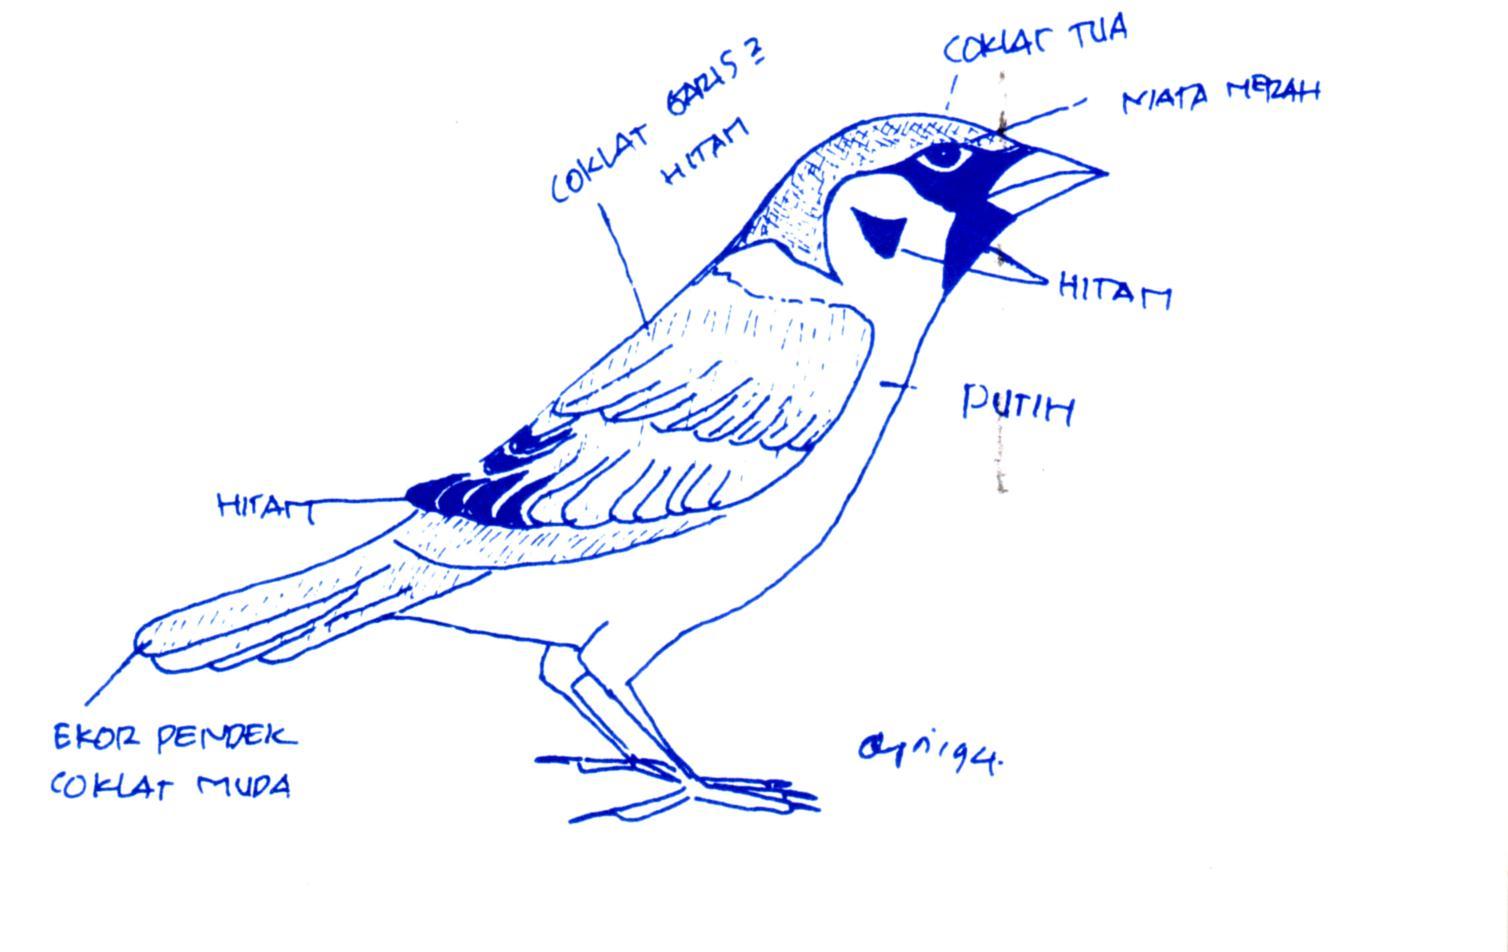 Koleksi Perpustakaan Ekologi Hewan Pengamatan Burung